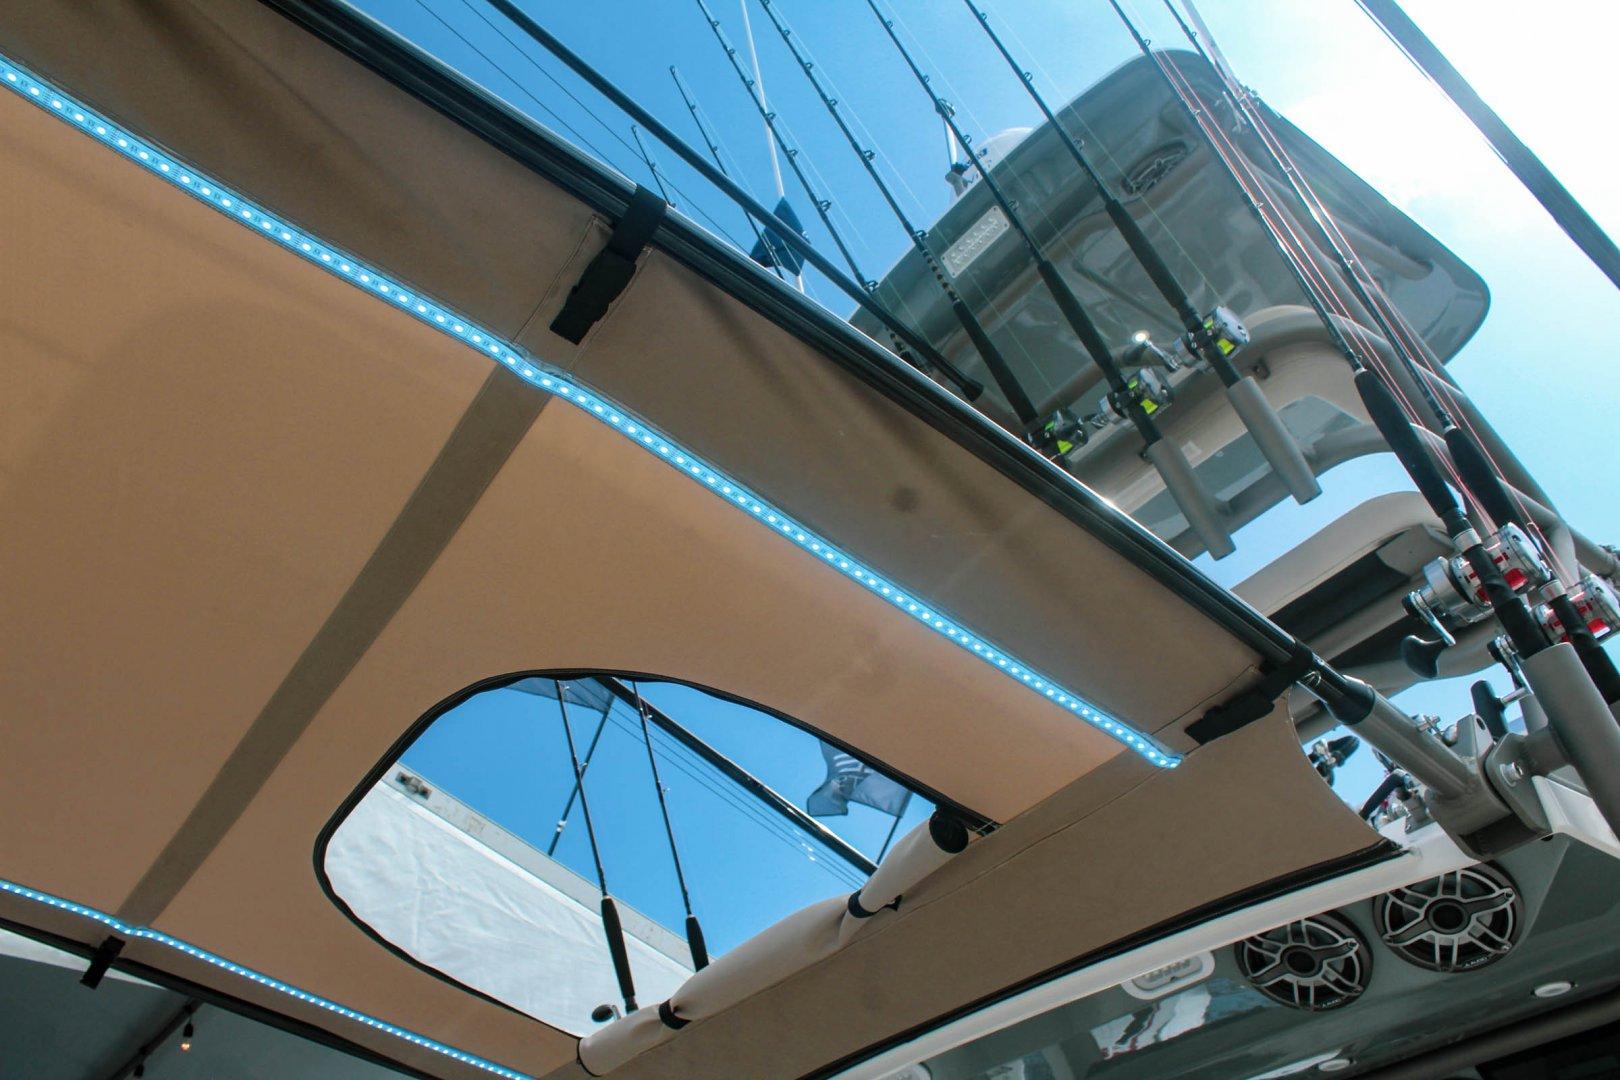 5 Sol 41 patented sunshade_web_size.jpg